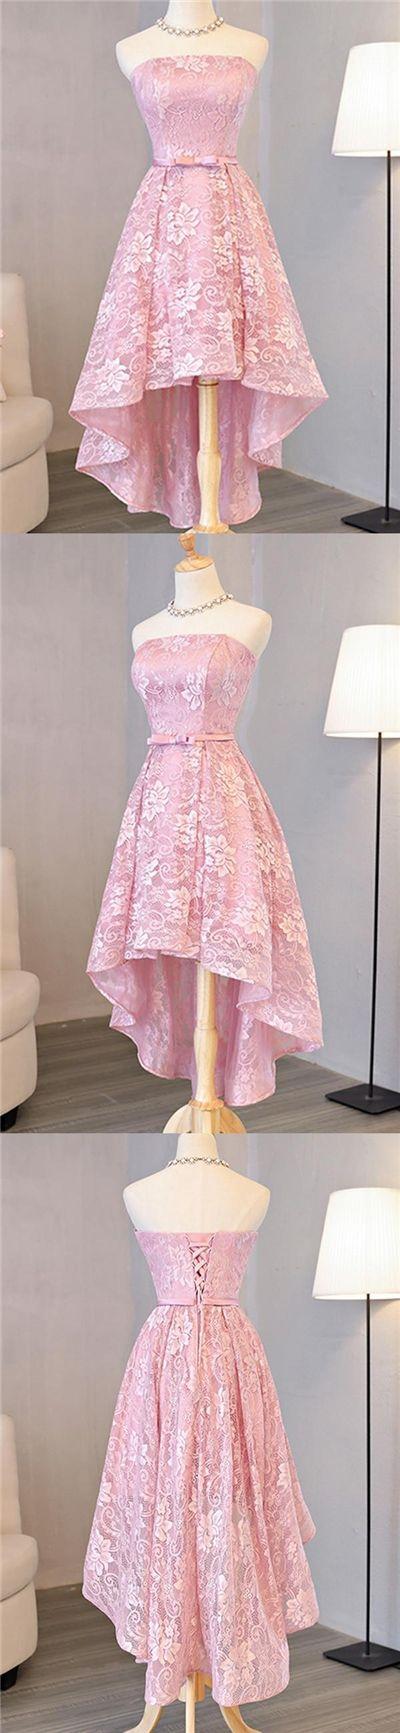 2017 Homecoming Dress Beautiful Lace Asymmetrical Short Prom Dress Party Dress JK240